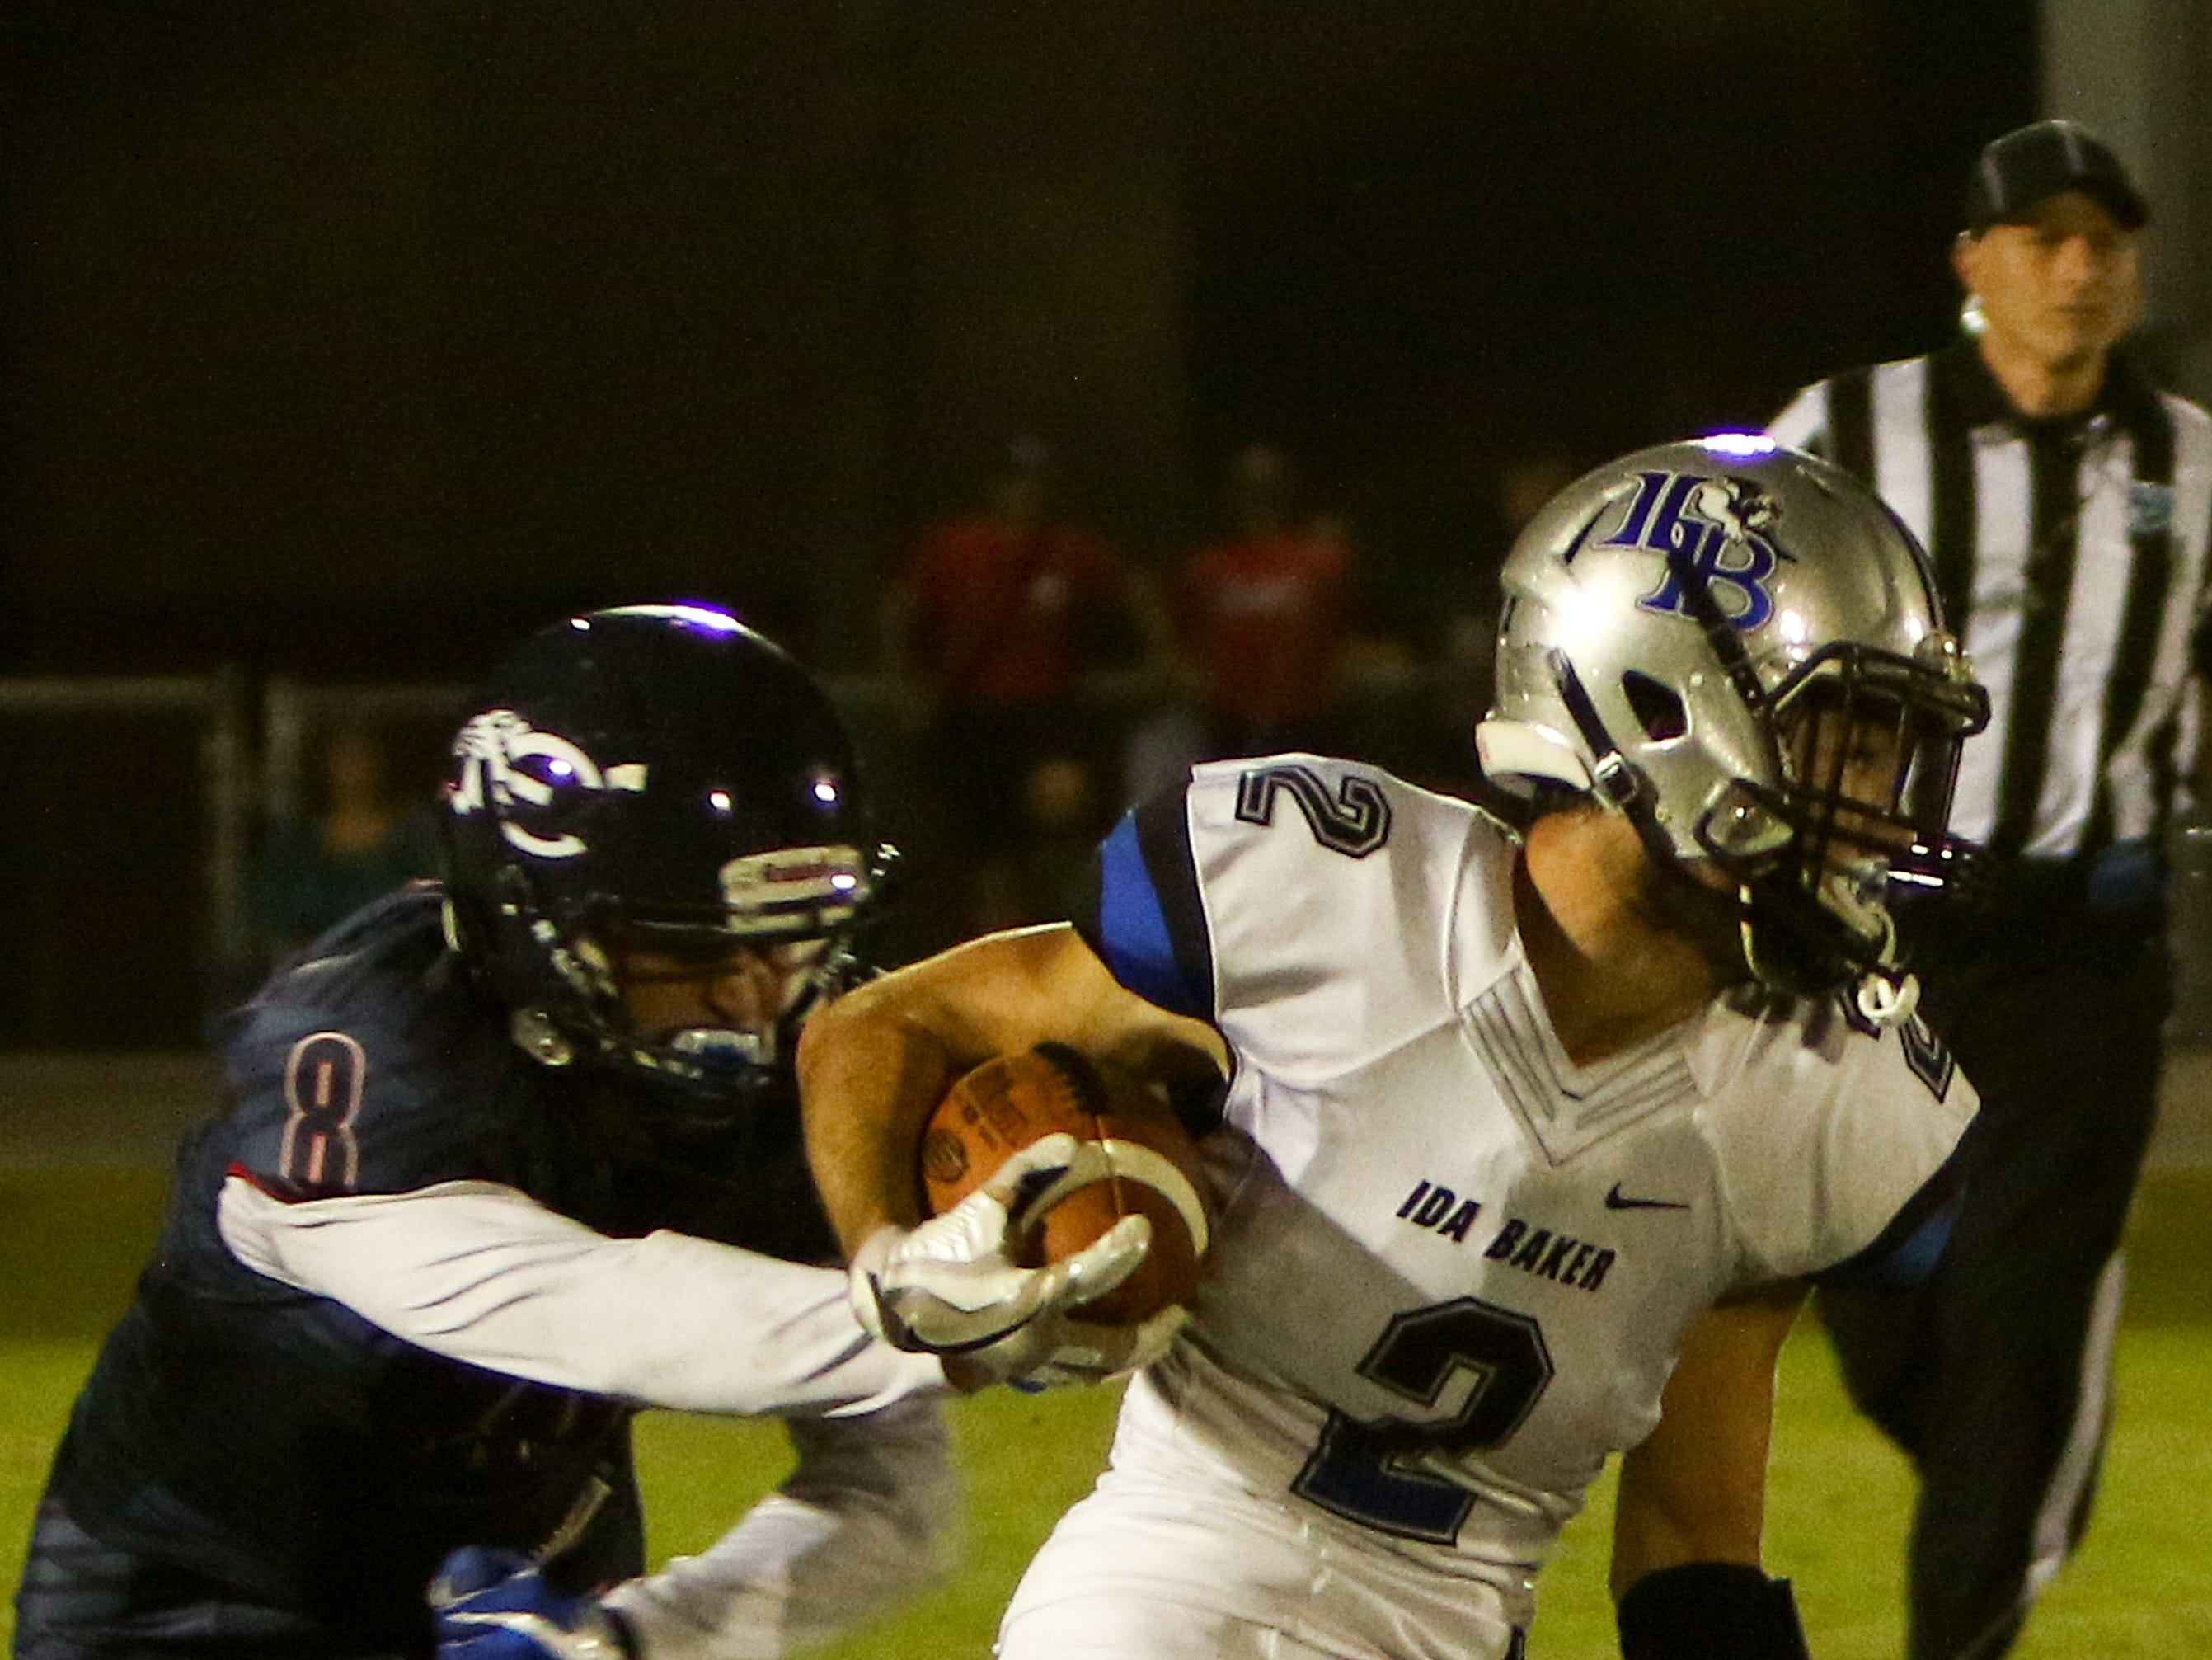 Estero's Bryce Ortengren tries to strip the ball from Bulldog receiver Patrick Mccabe.